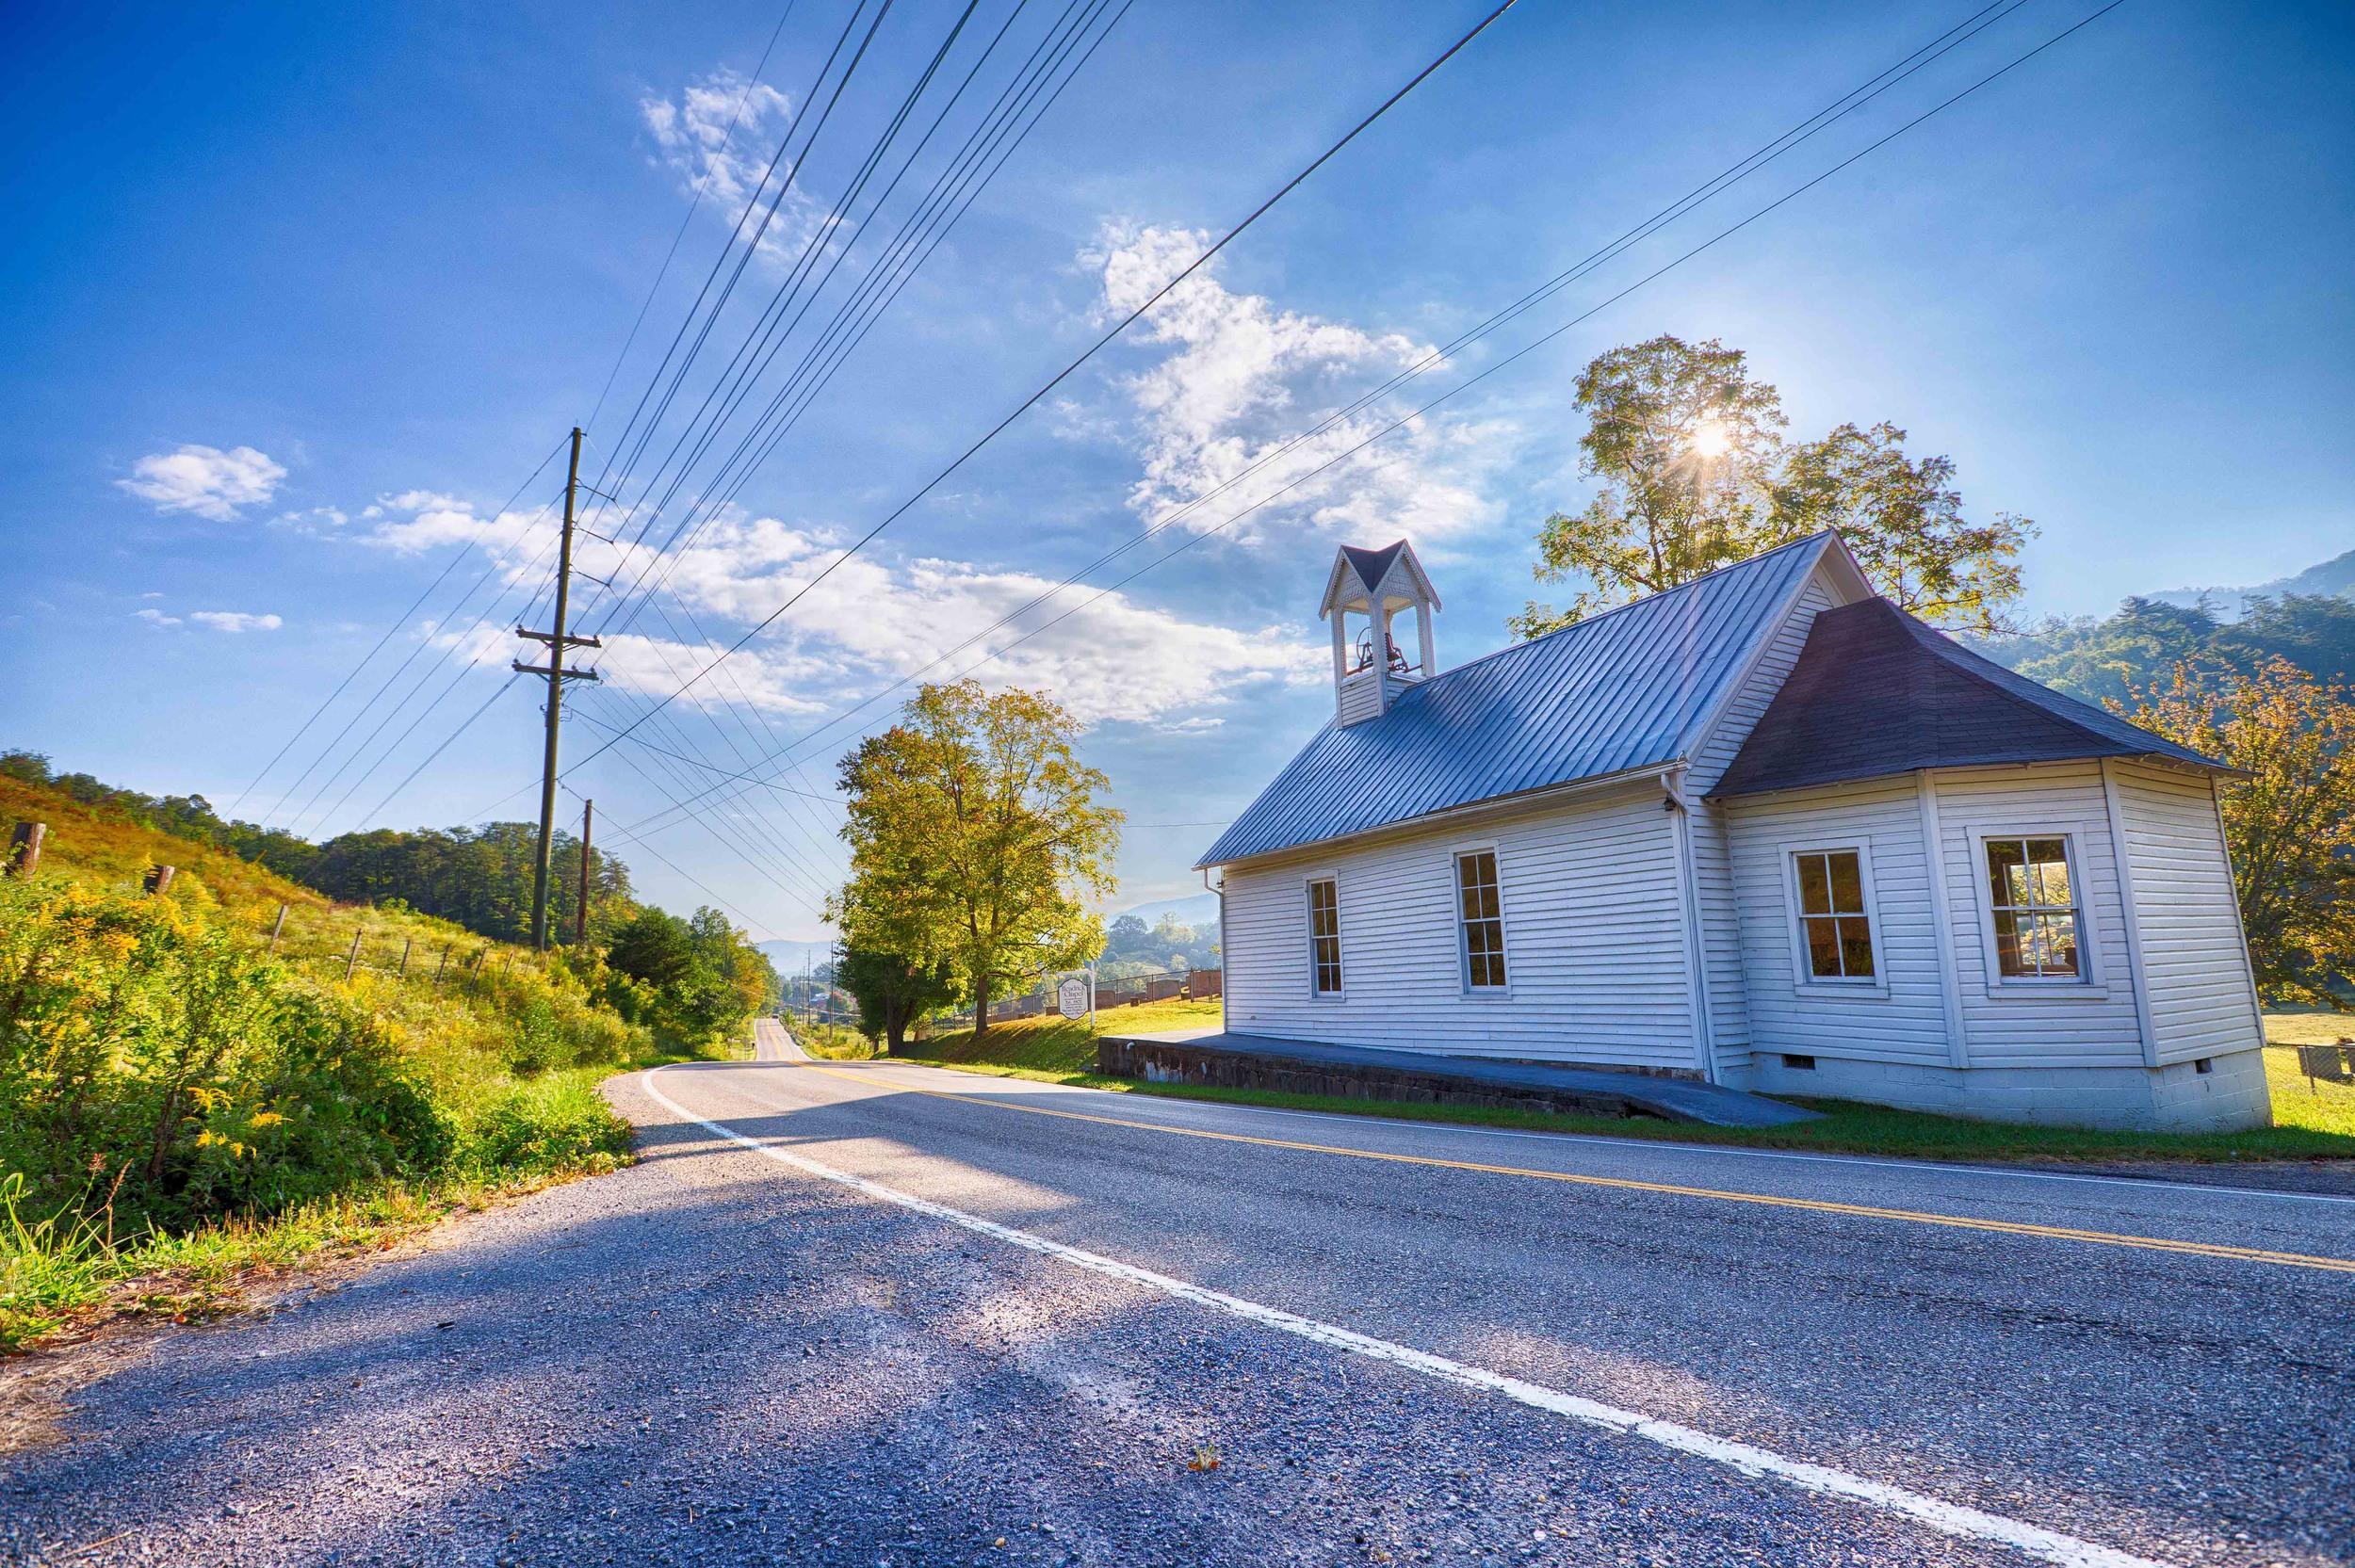 Tennessee_041.jpg